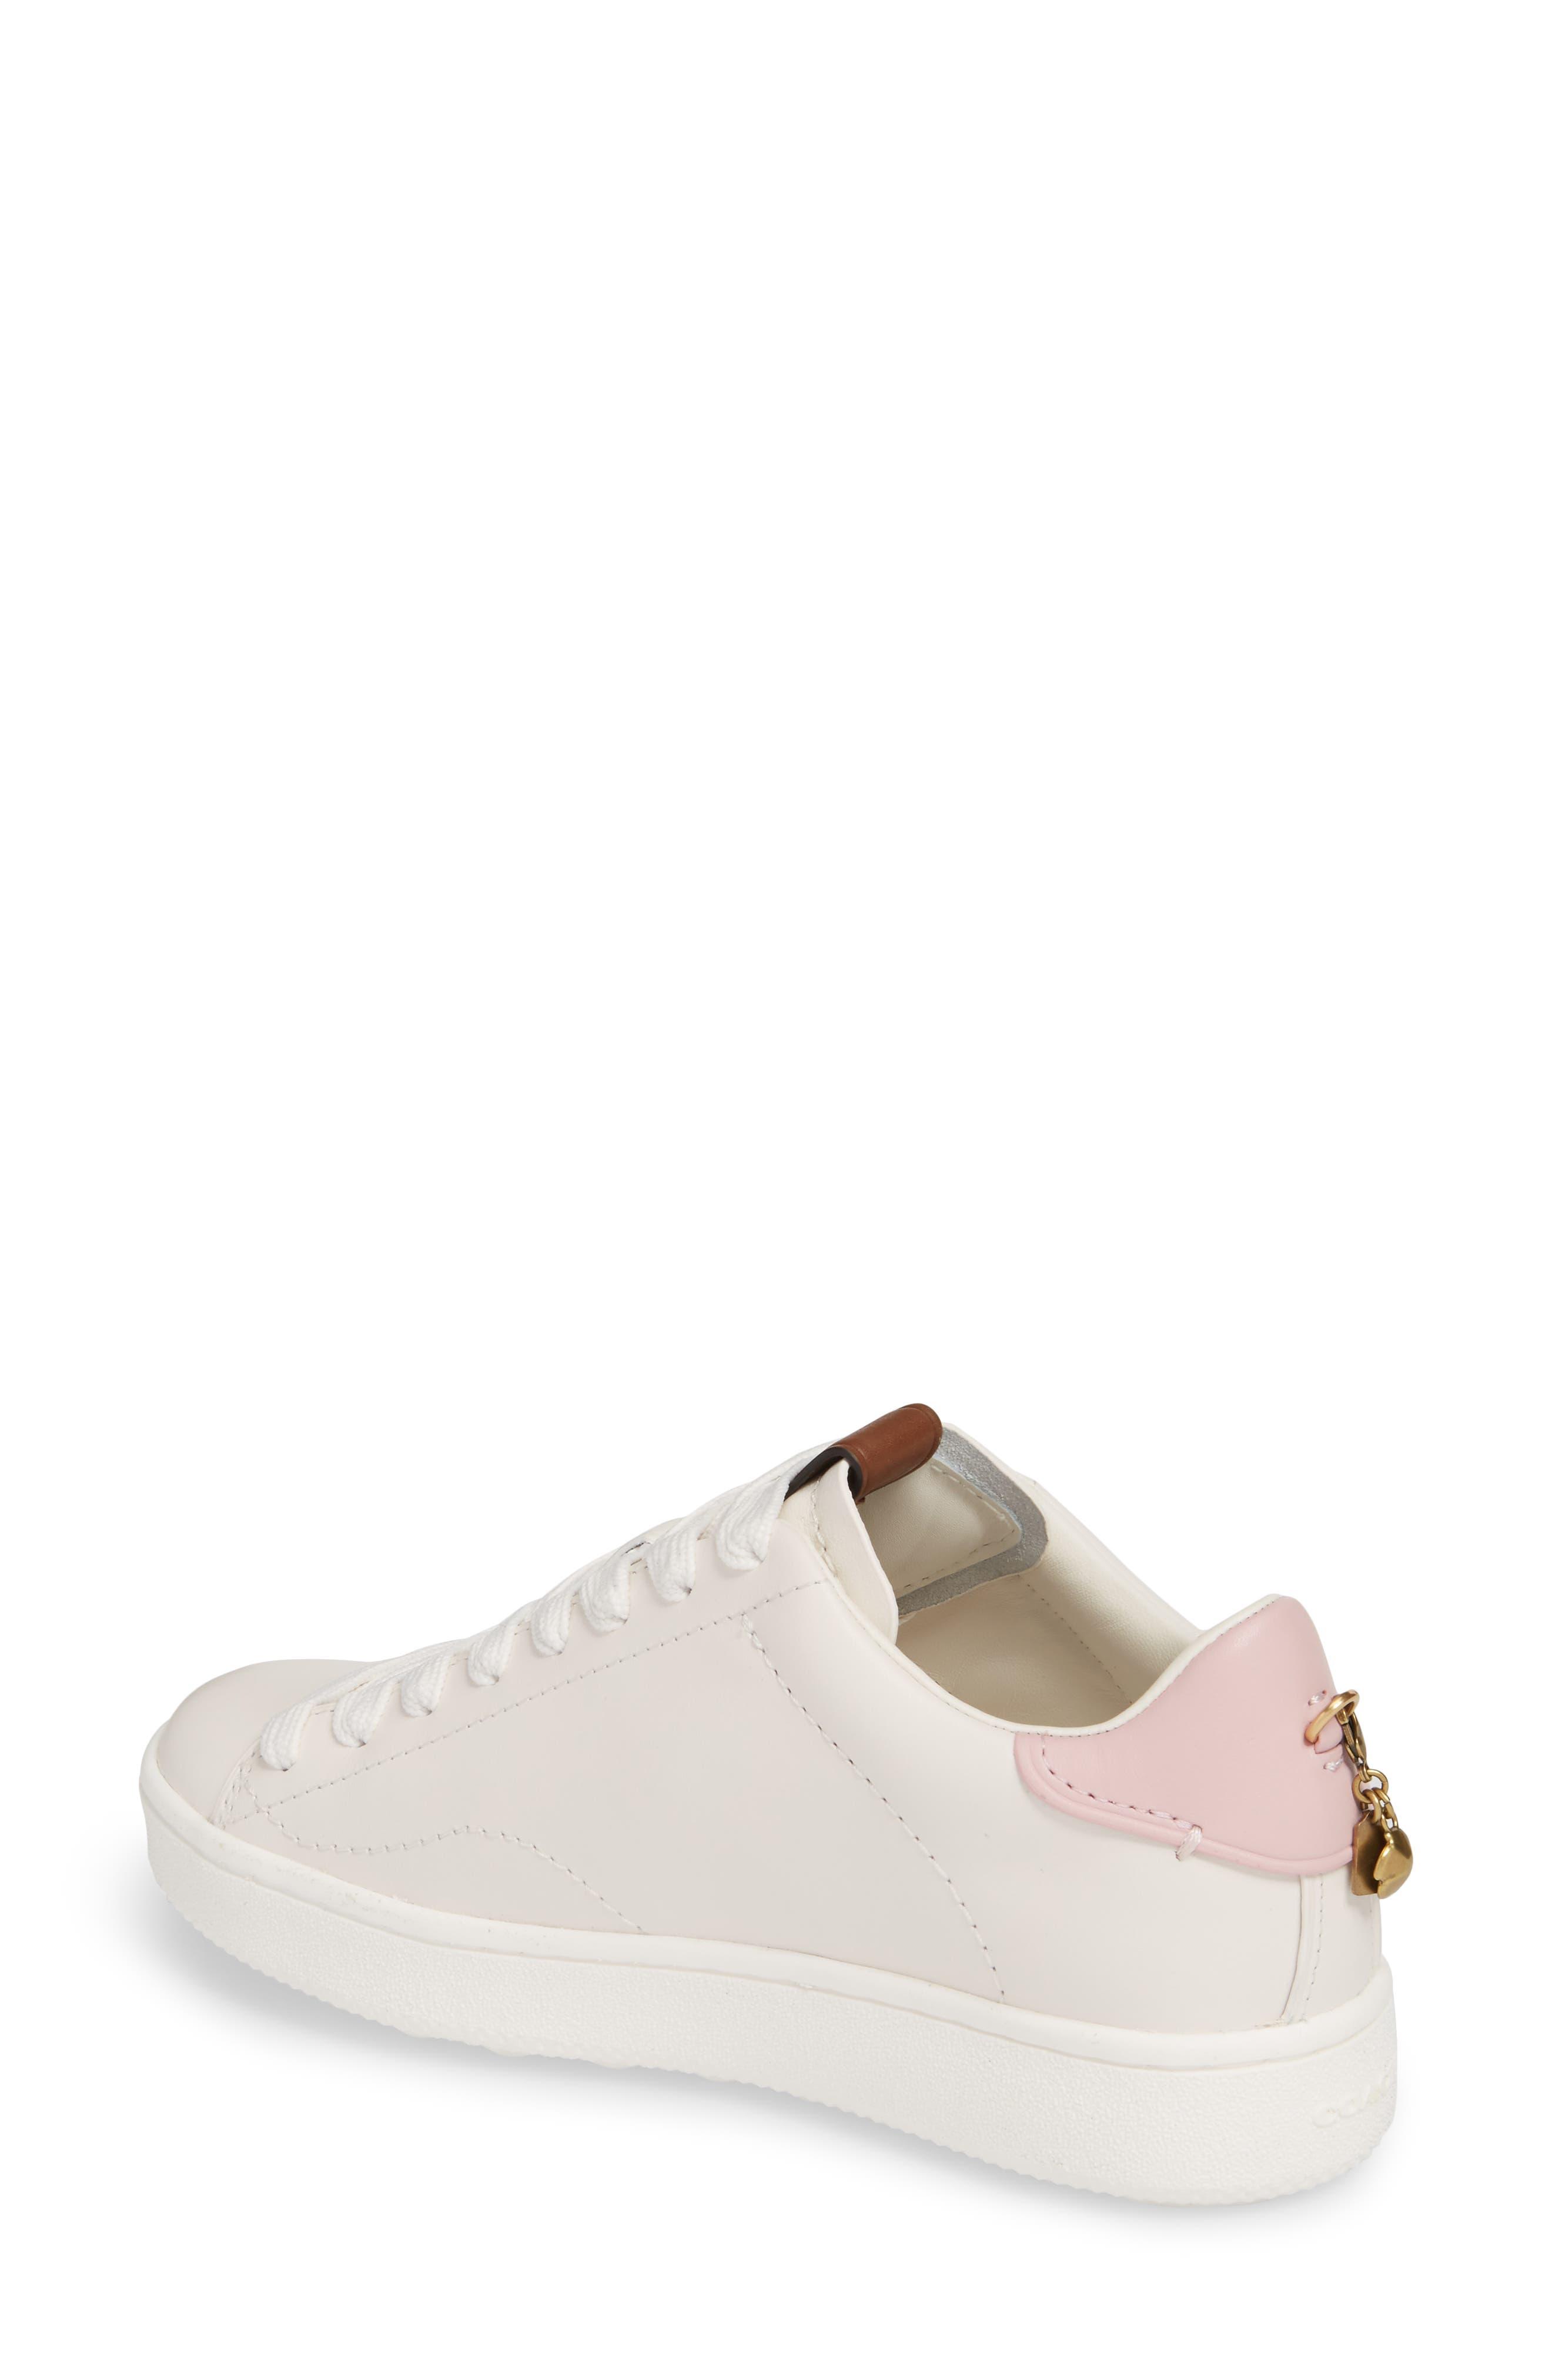 COACH, Sneaker, Alternate thumbnail 2, color, WHITE/ PETAL LEATHER